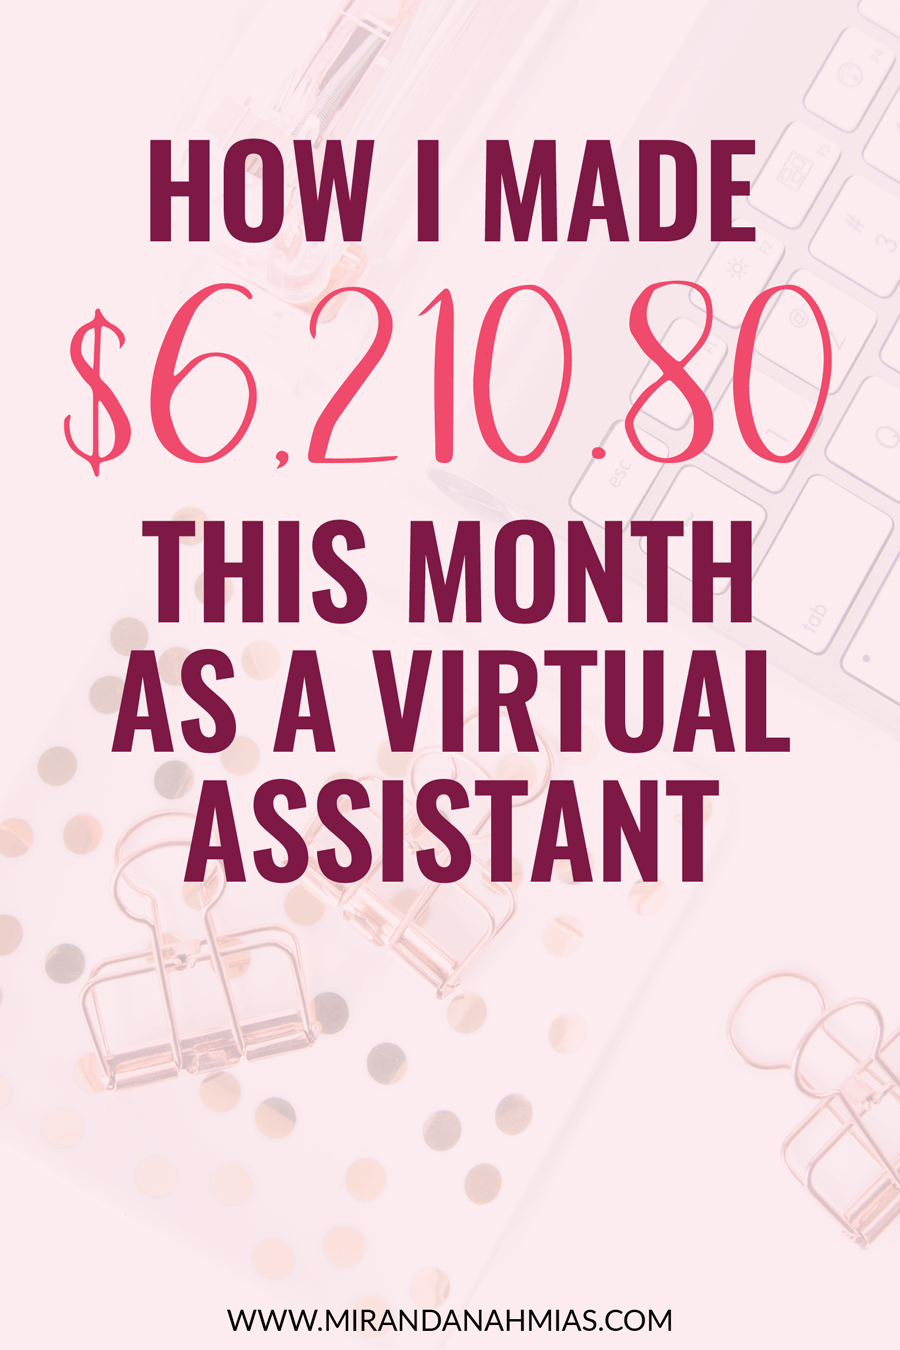 How I Made $6,210.80 as a Virtual Assistant This Month // Miranda Nahmias